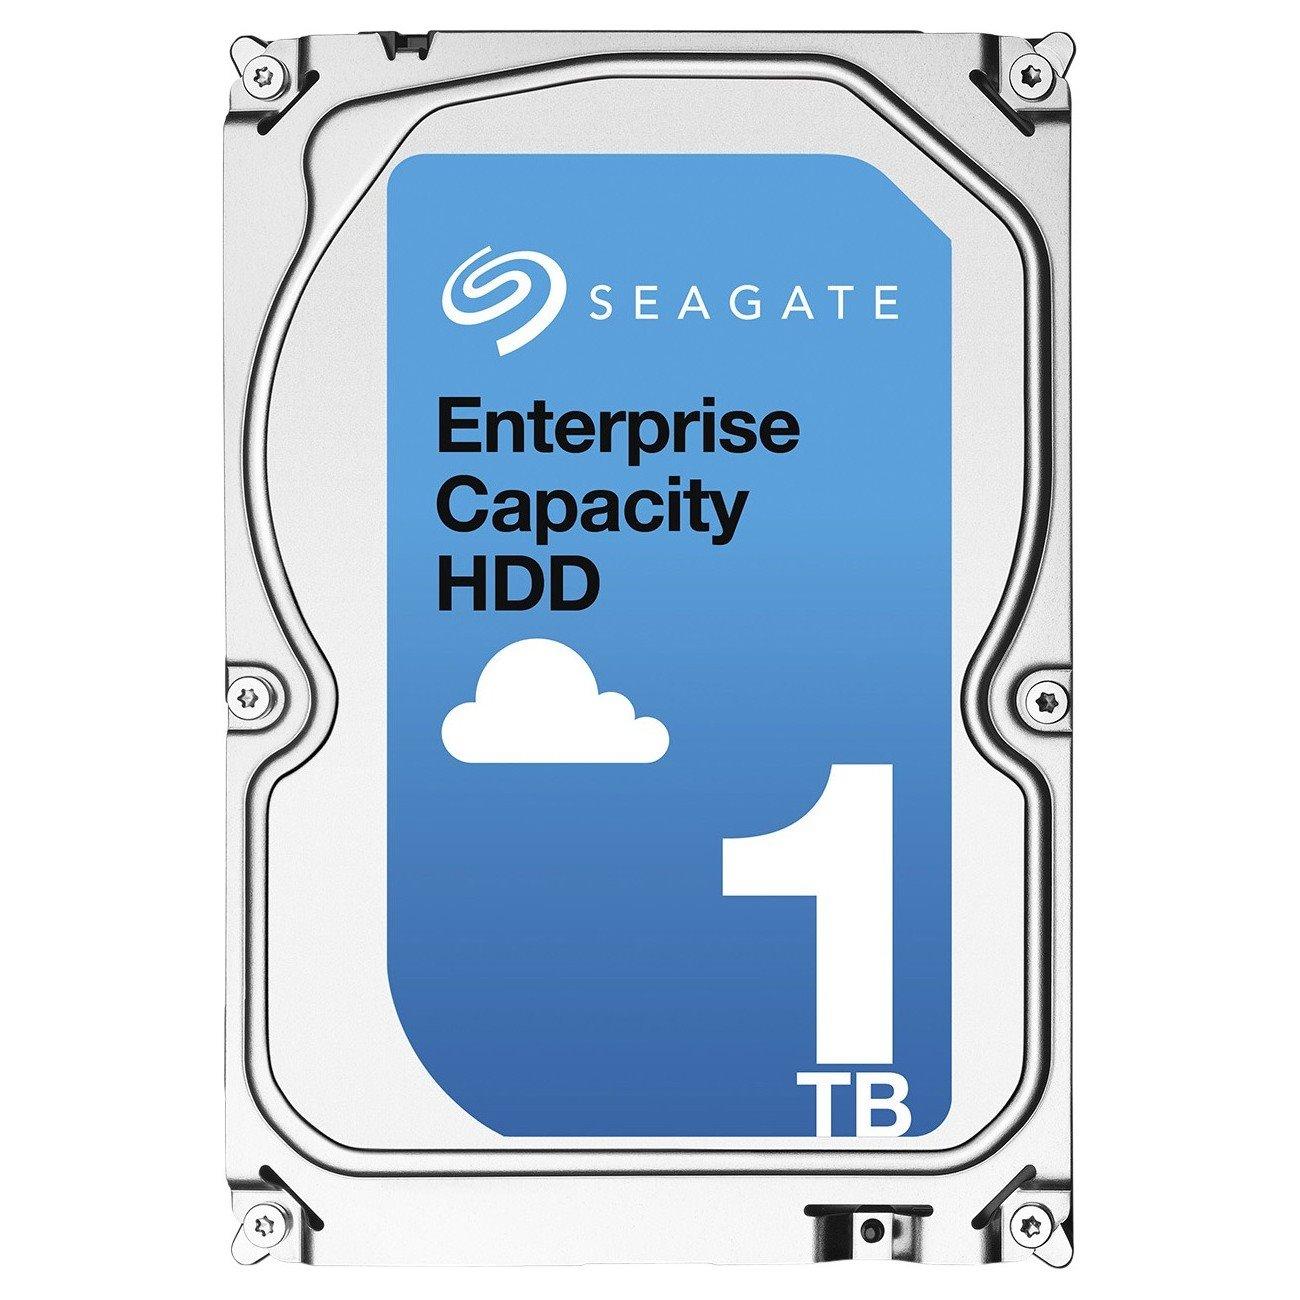 "Seagate ST1000NM0008 1 TB Hard Drive - SATA (SATA/600) - 3.5"" Drive - Internal"